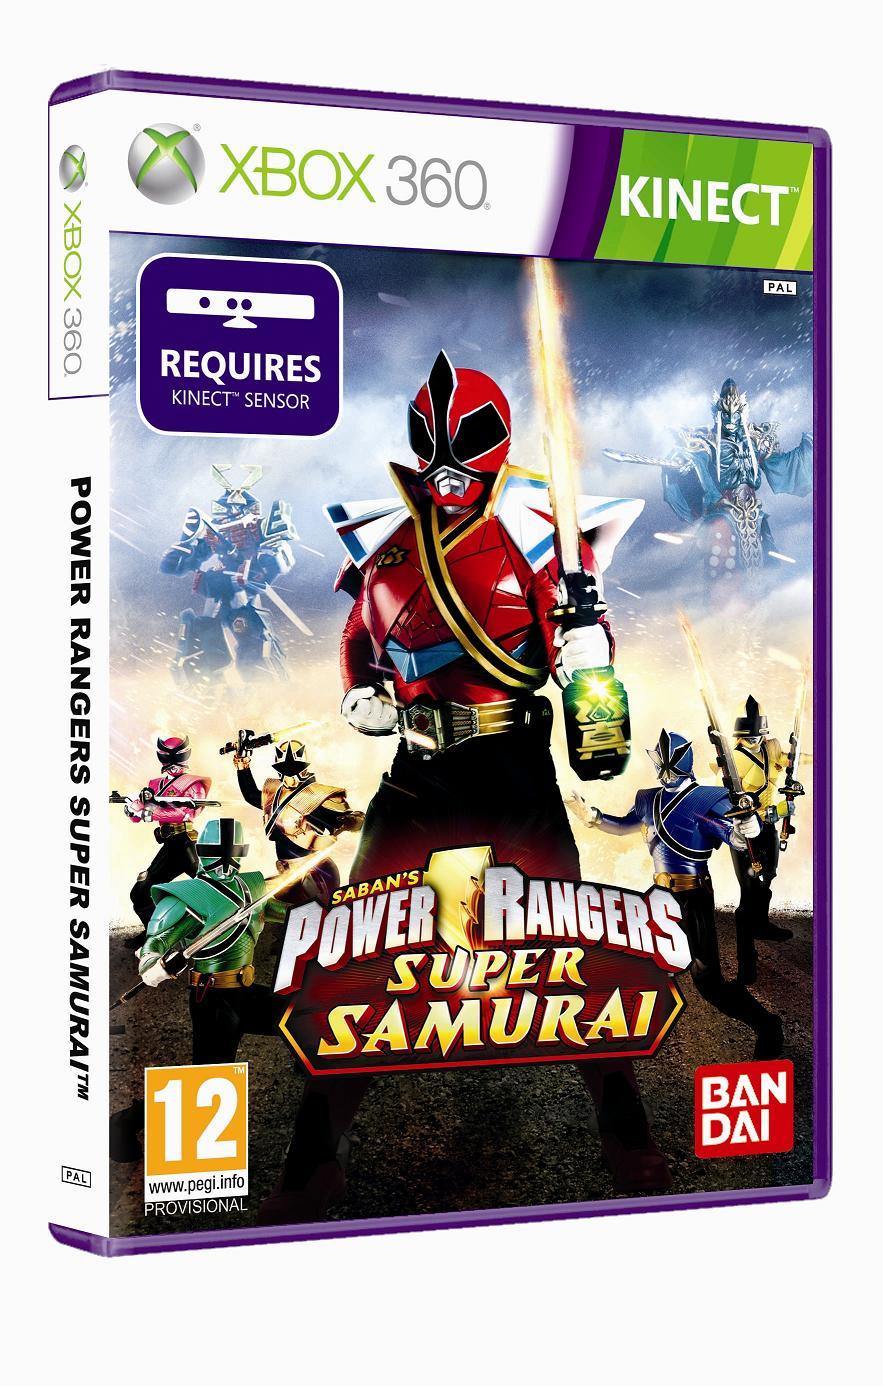 Gamescom 2012: Power Rangers Super Samurai